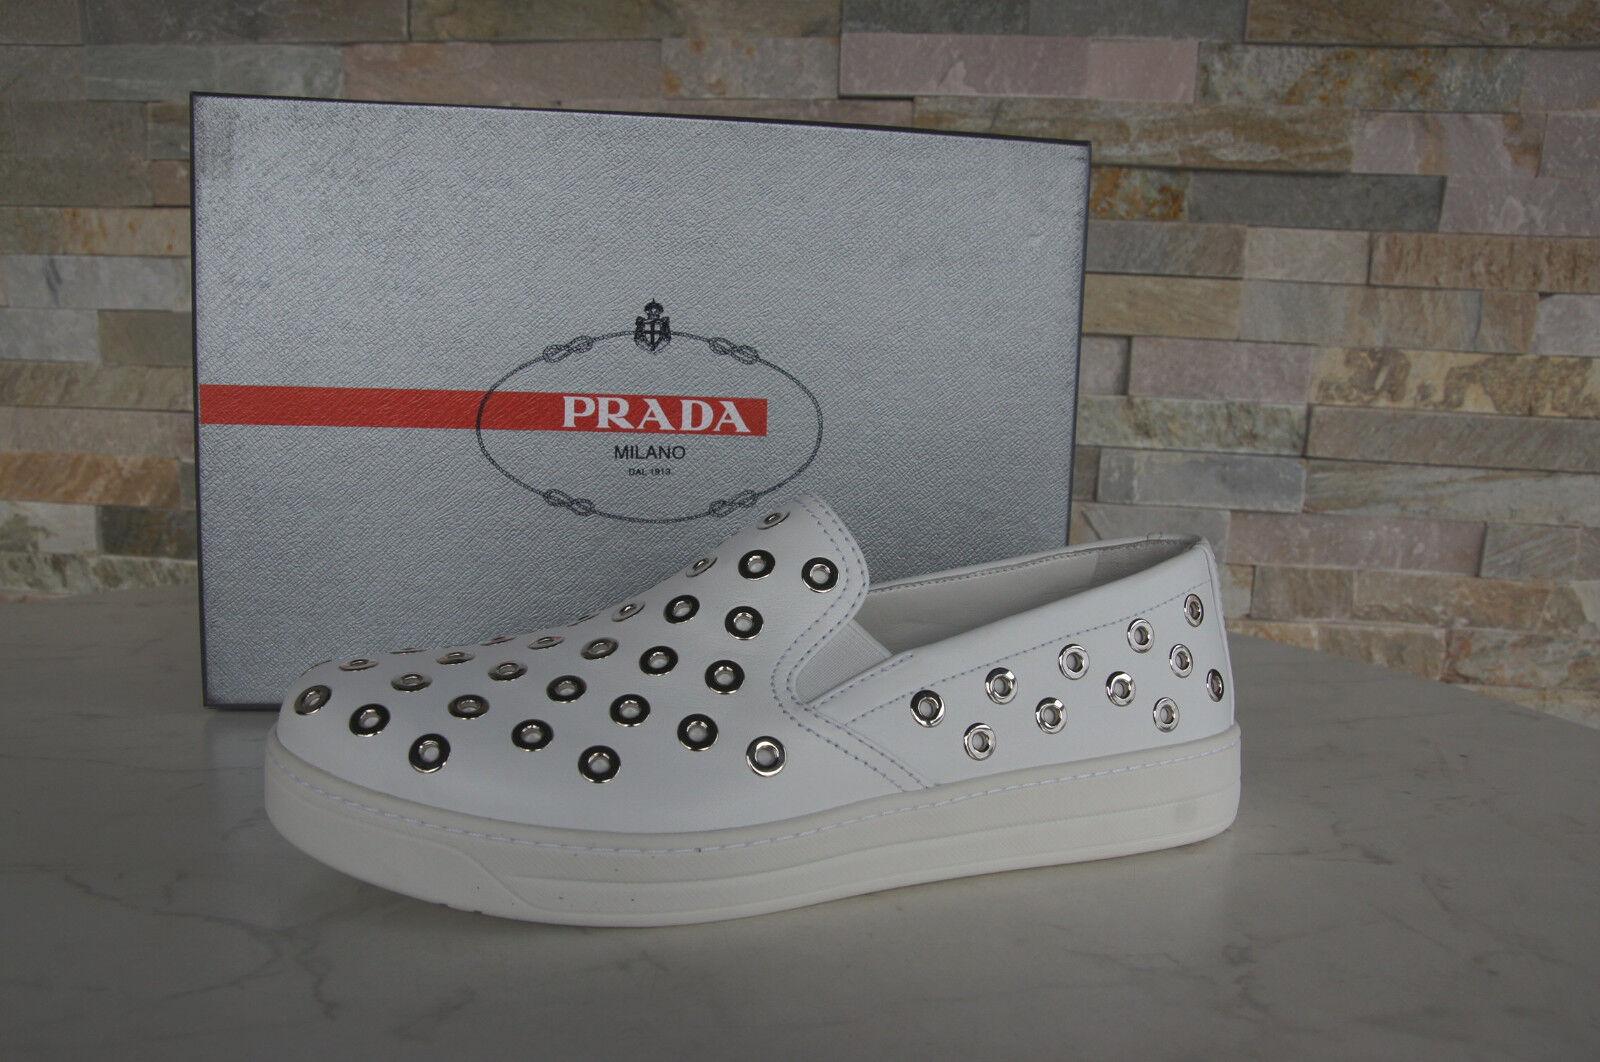 PRADA Gr Kalb 38 Slipper Sneakers Slip On Schuhe Kalb Gr 3S6159 weiß NEU 562479